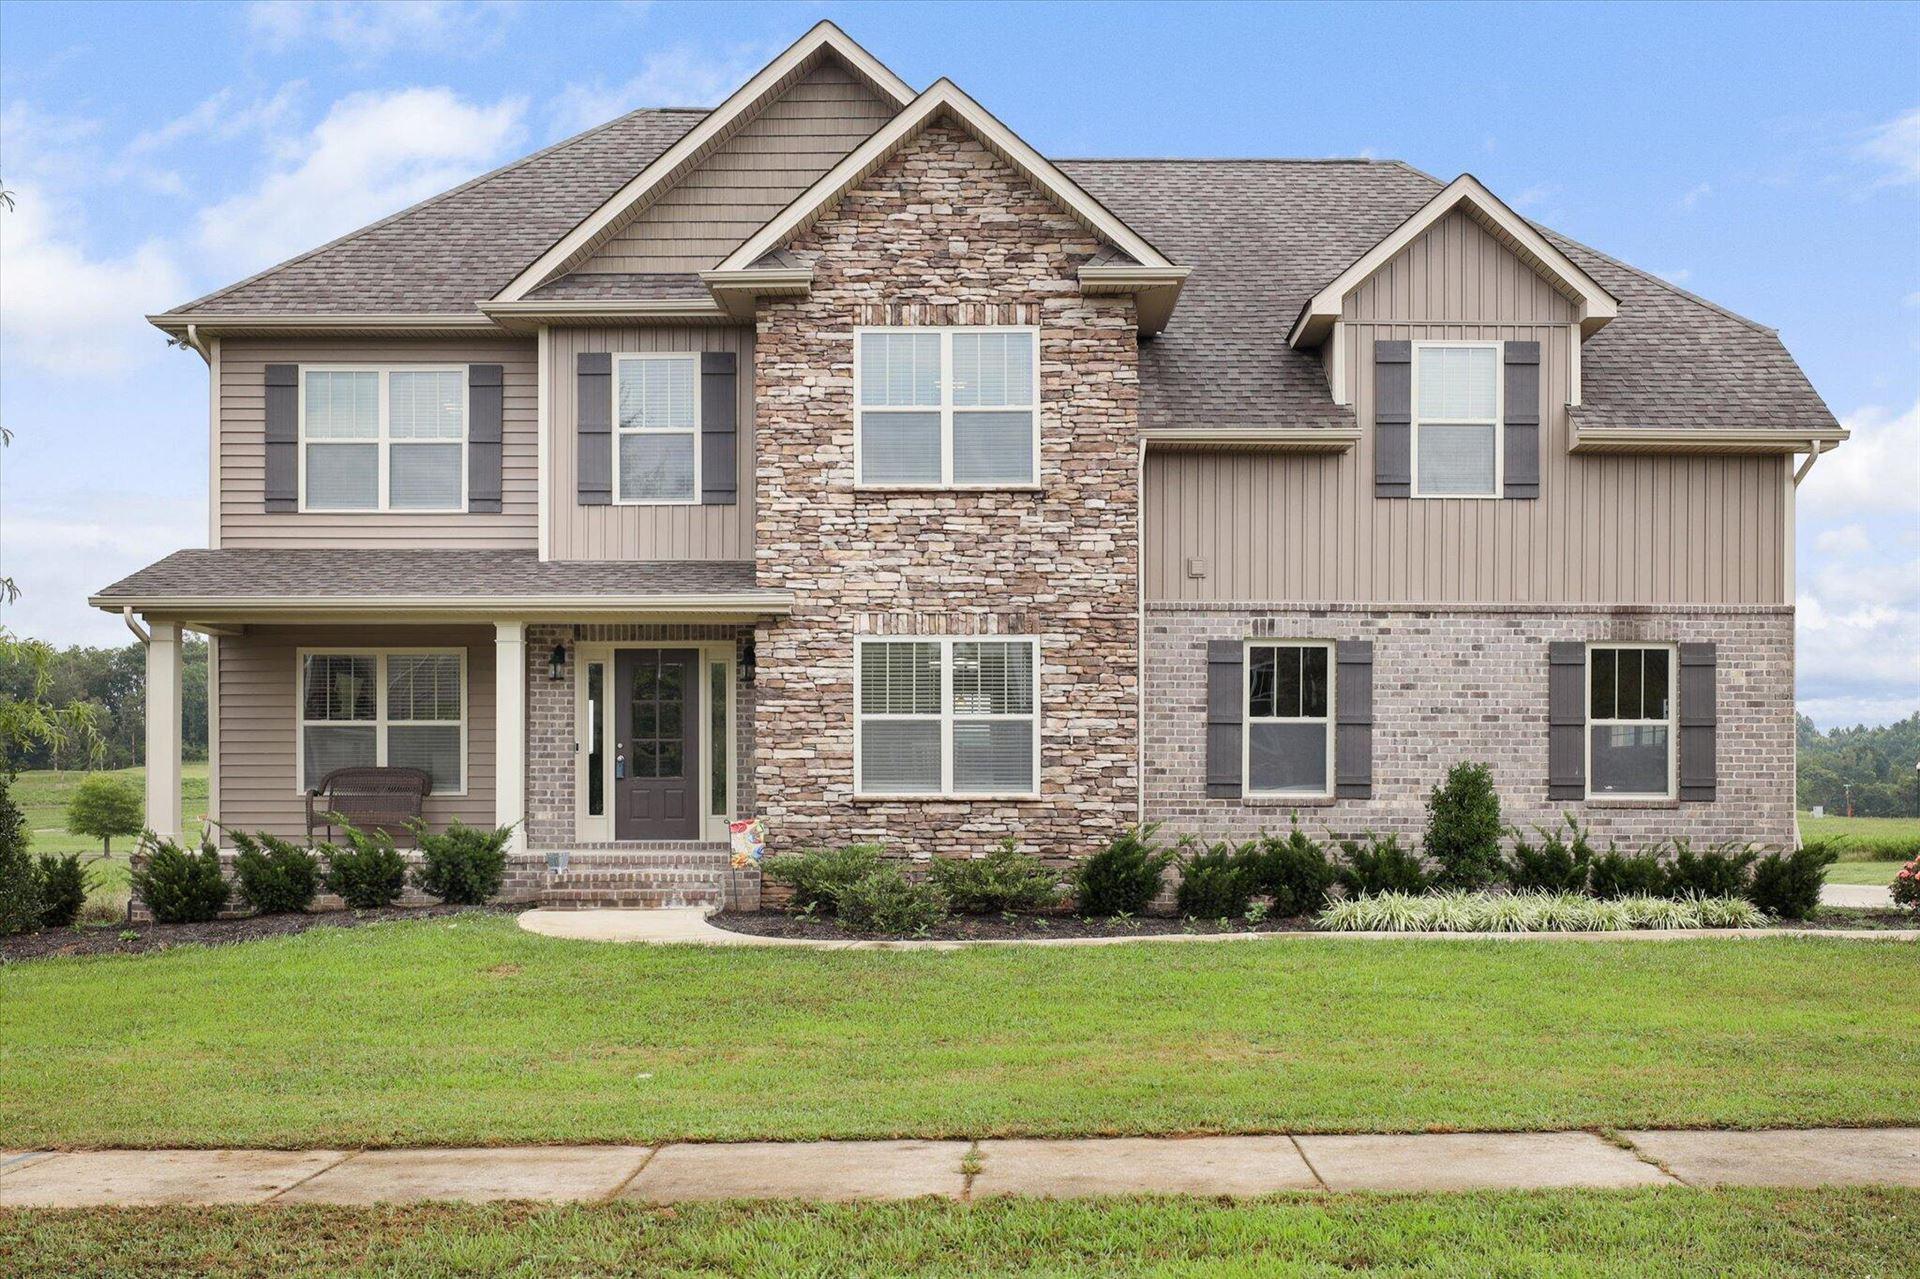 Photo of 105 Checkerberry Rd, Oak Ridge, TN 37830 (MLS # 1161049)